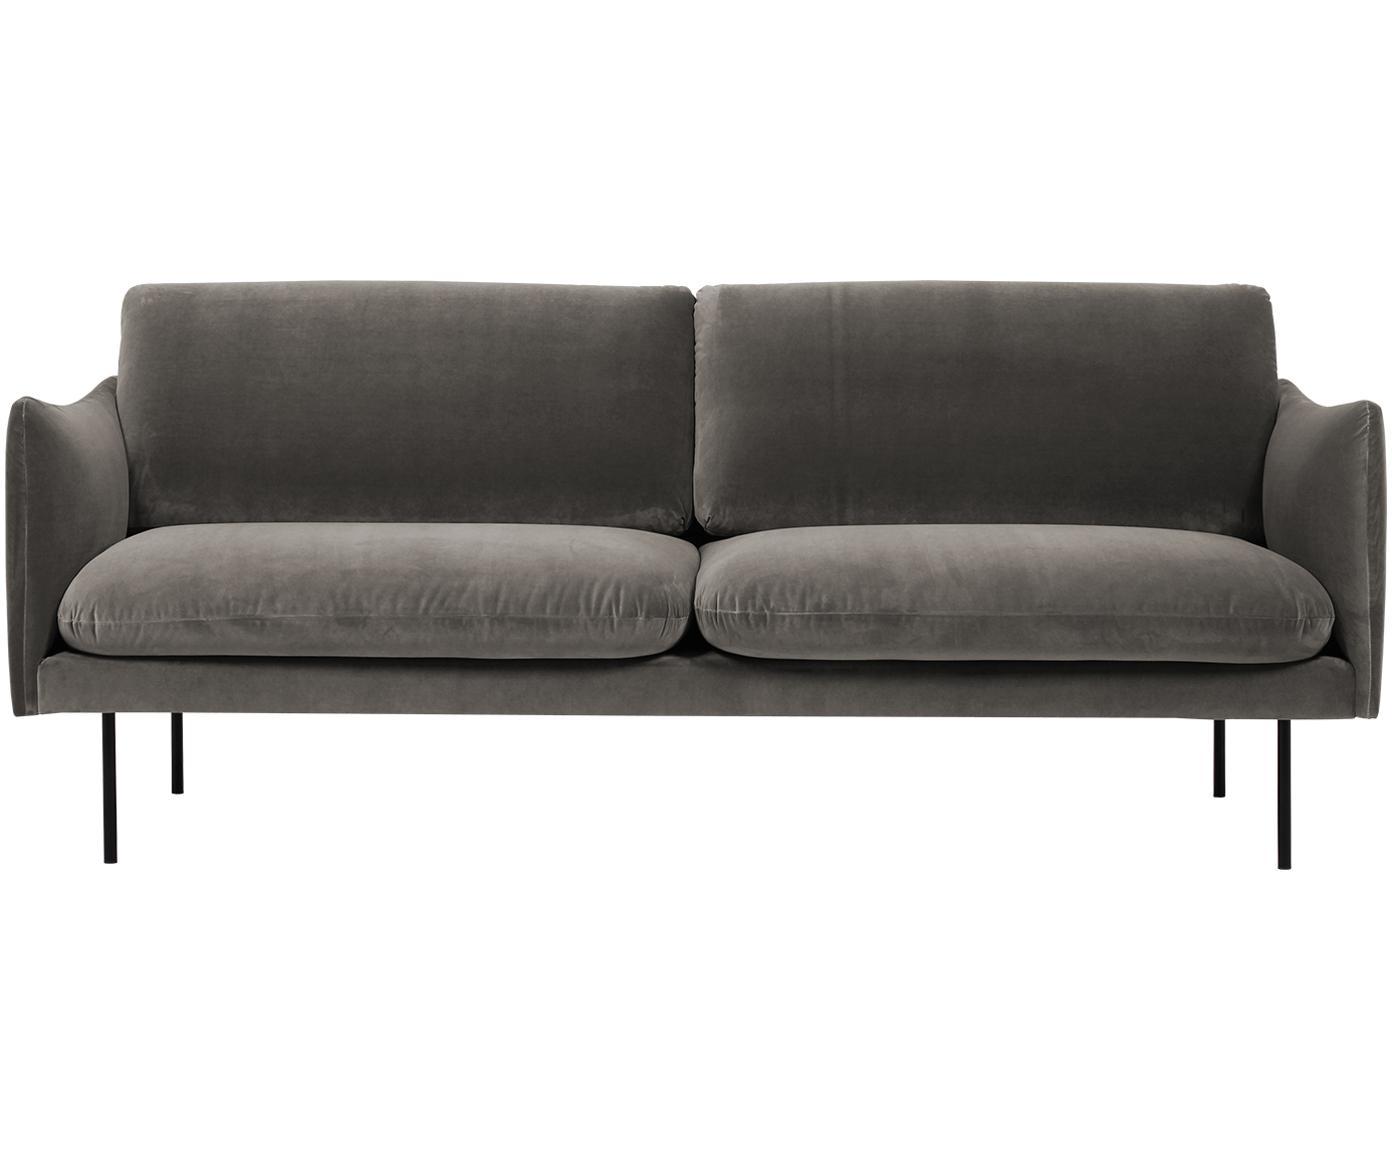 Samt-Sofa Moby (2-Sitzer), Bezug: Samt (Hochwertiger Polyes, Gestell: Massives Kiefernholz, Samt Braungrau, B 170 x T 95 cm